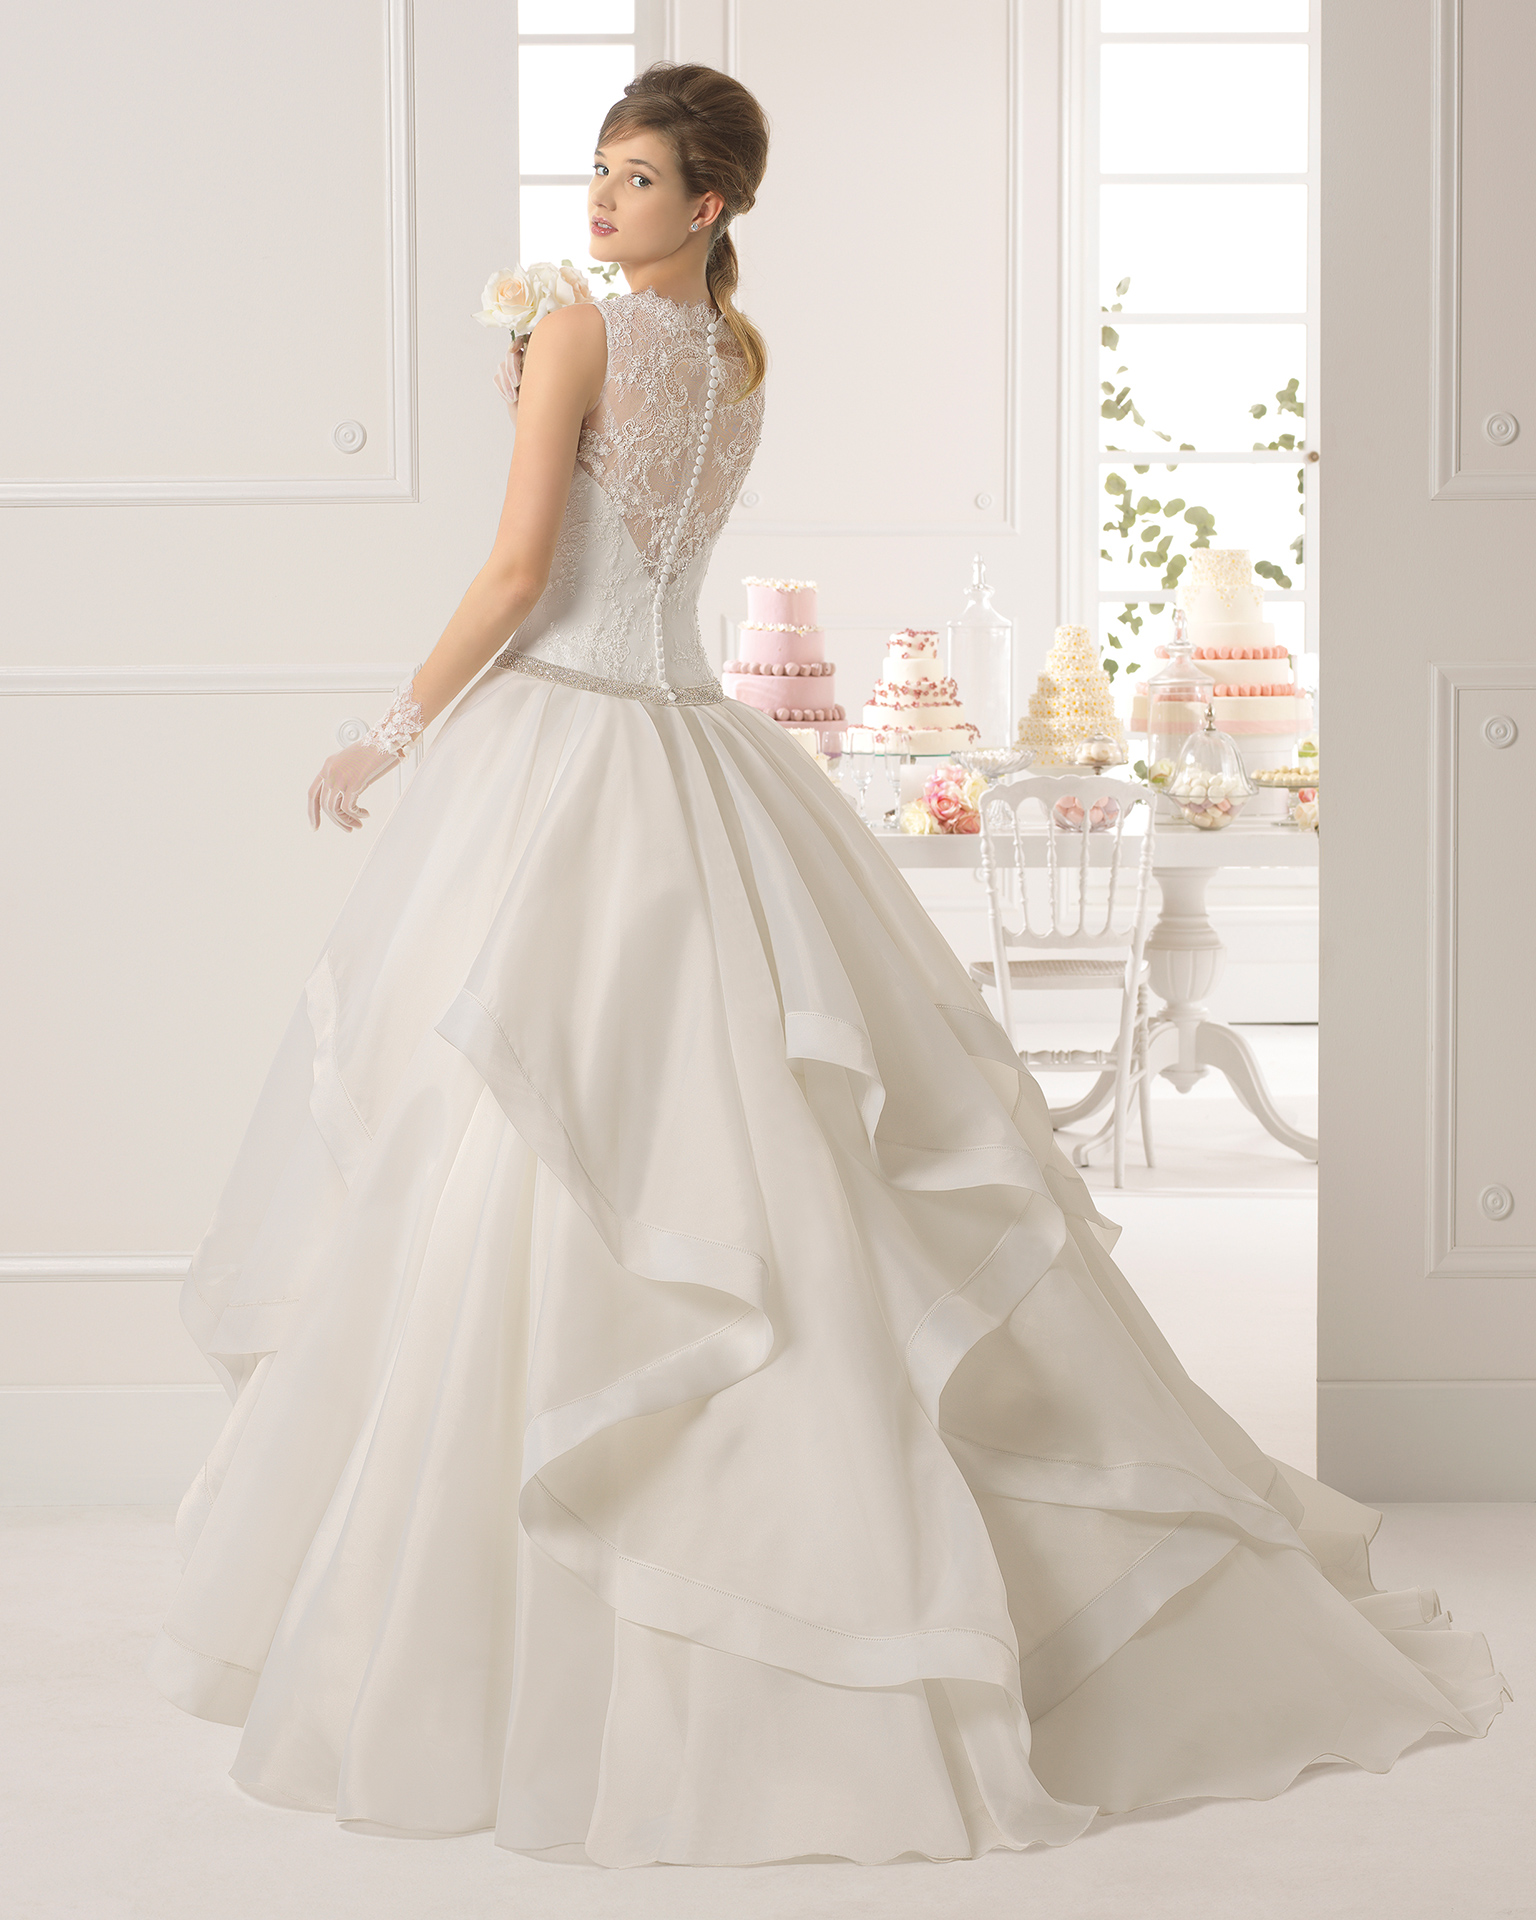 Vestido novia anabel pronovias